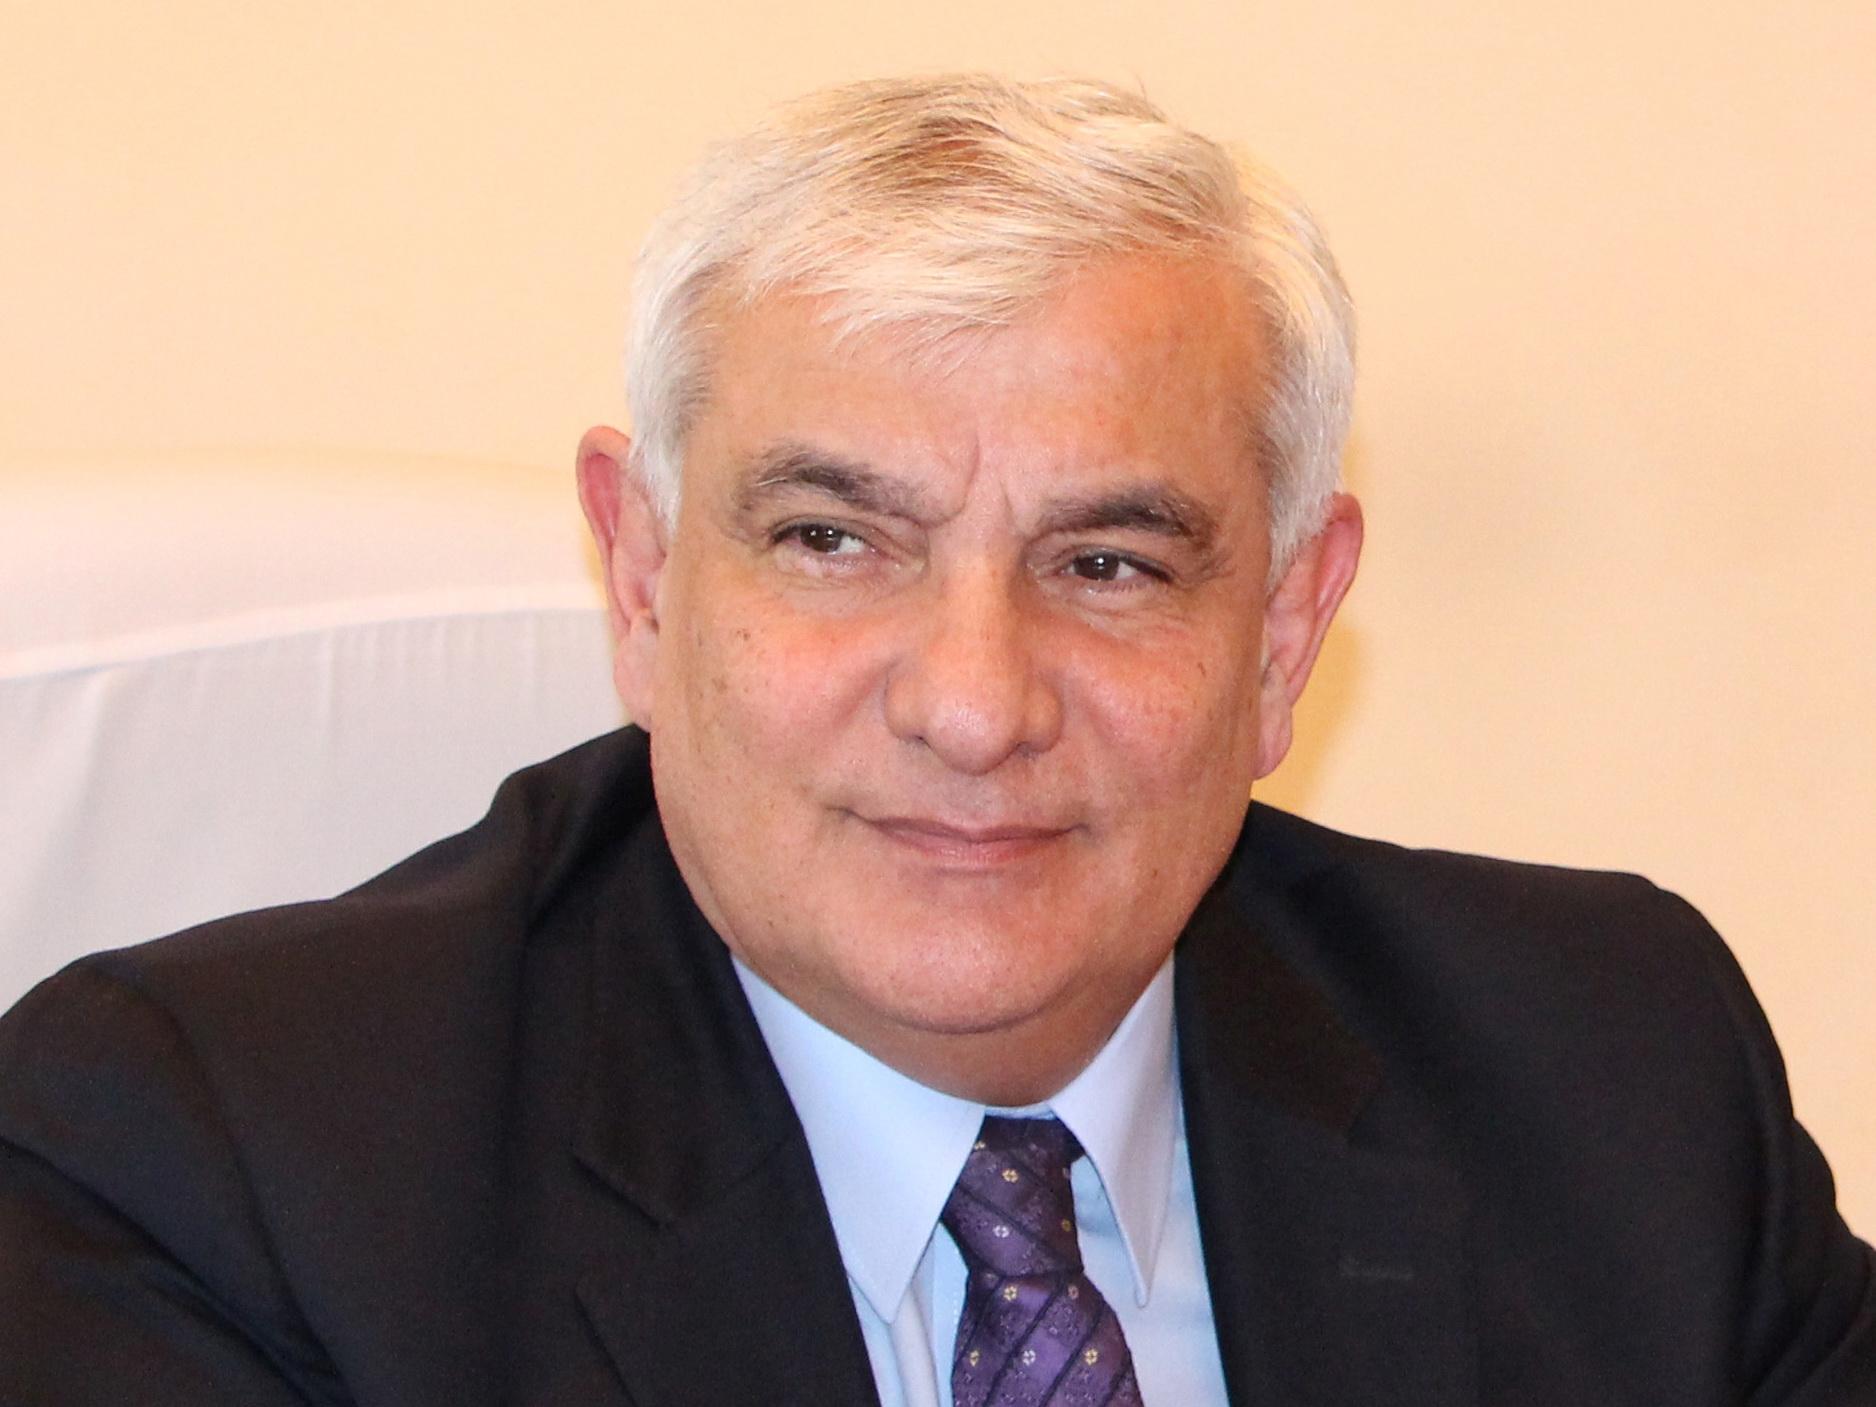 Ректор Камал Абдулла: «Мы постоянно расширяем связи с зарубежными вузами»